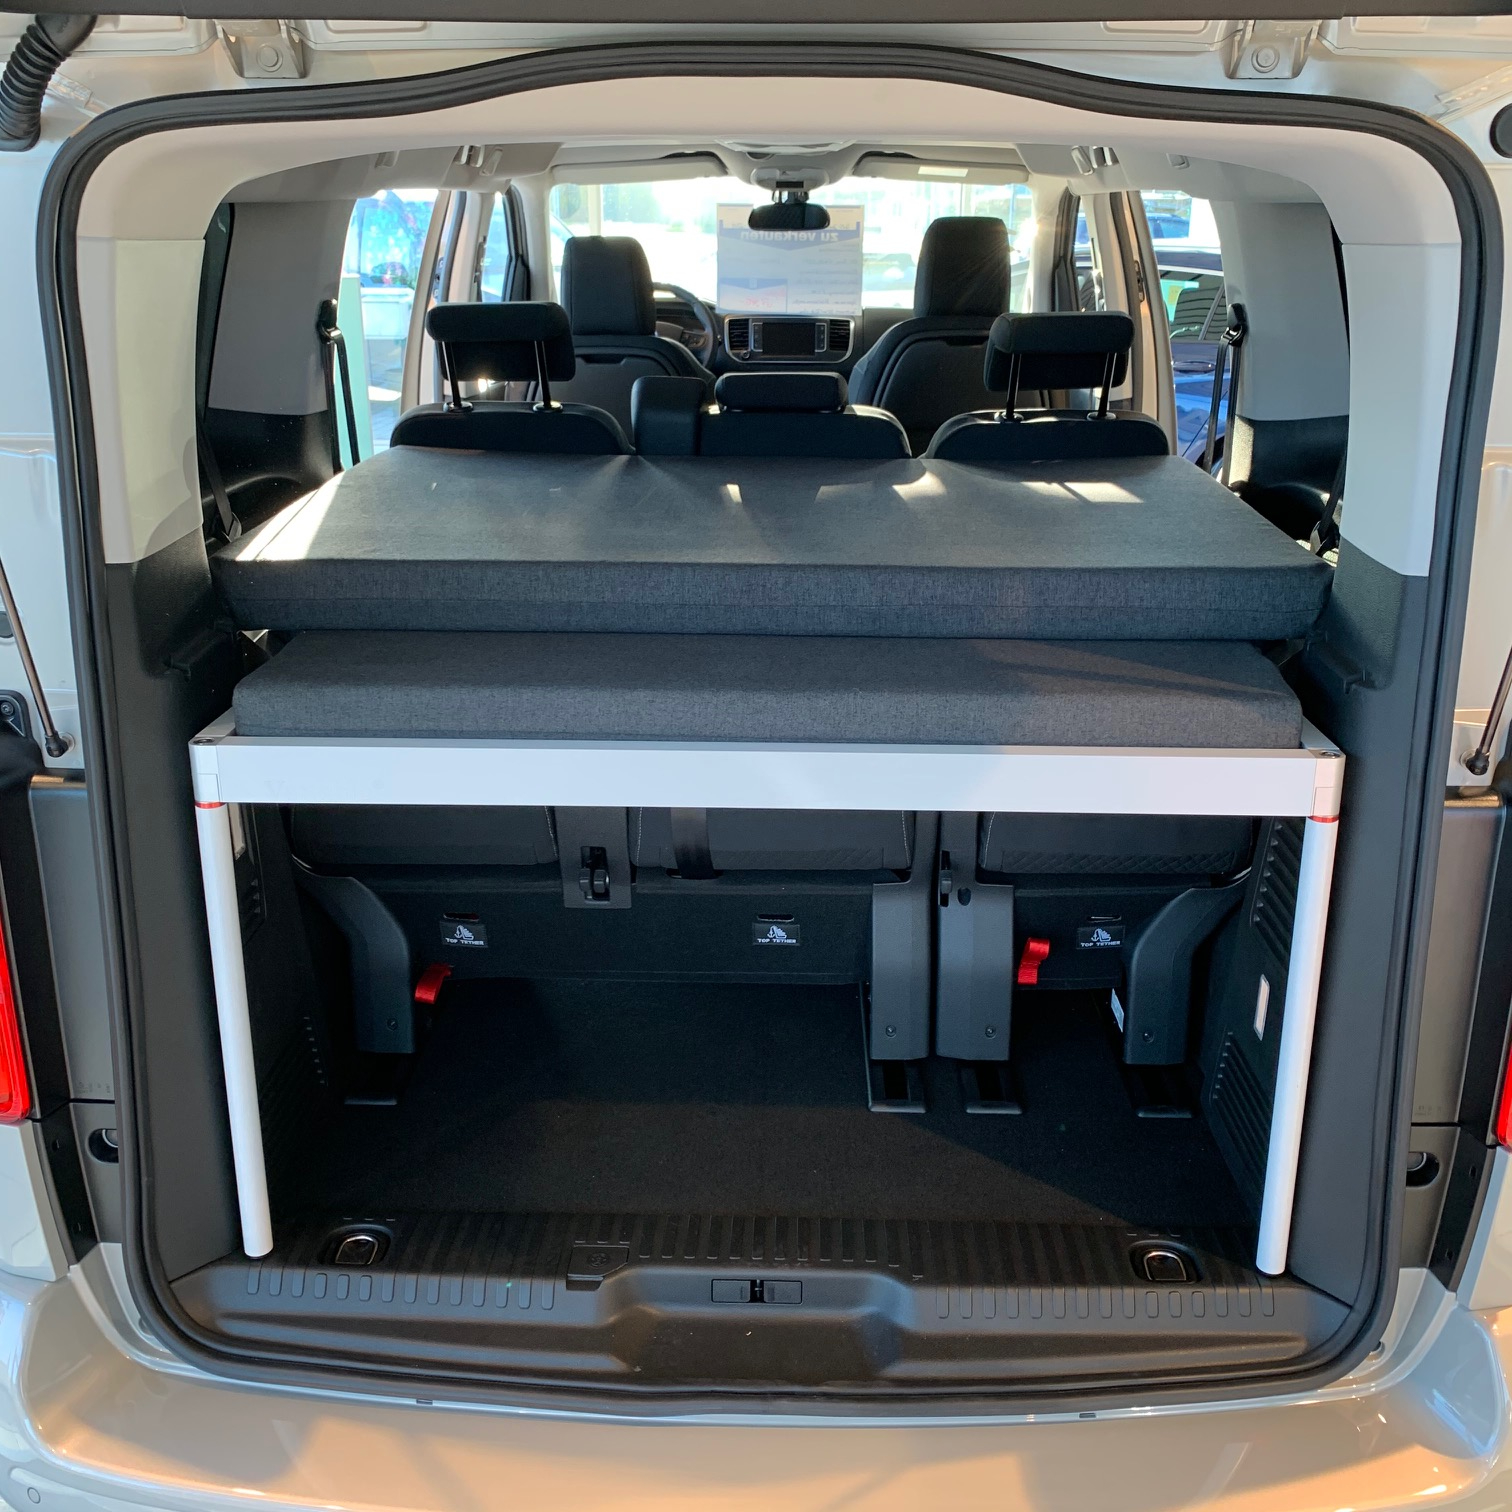 Opel Zafira Life M L2 Vanable Macht Jeden Van Zum Wohnmobil